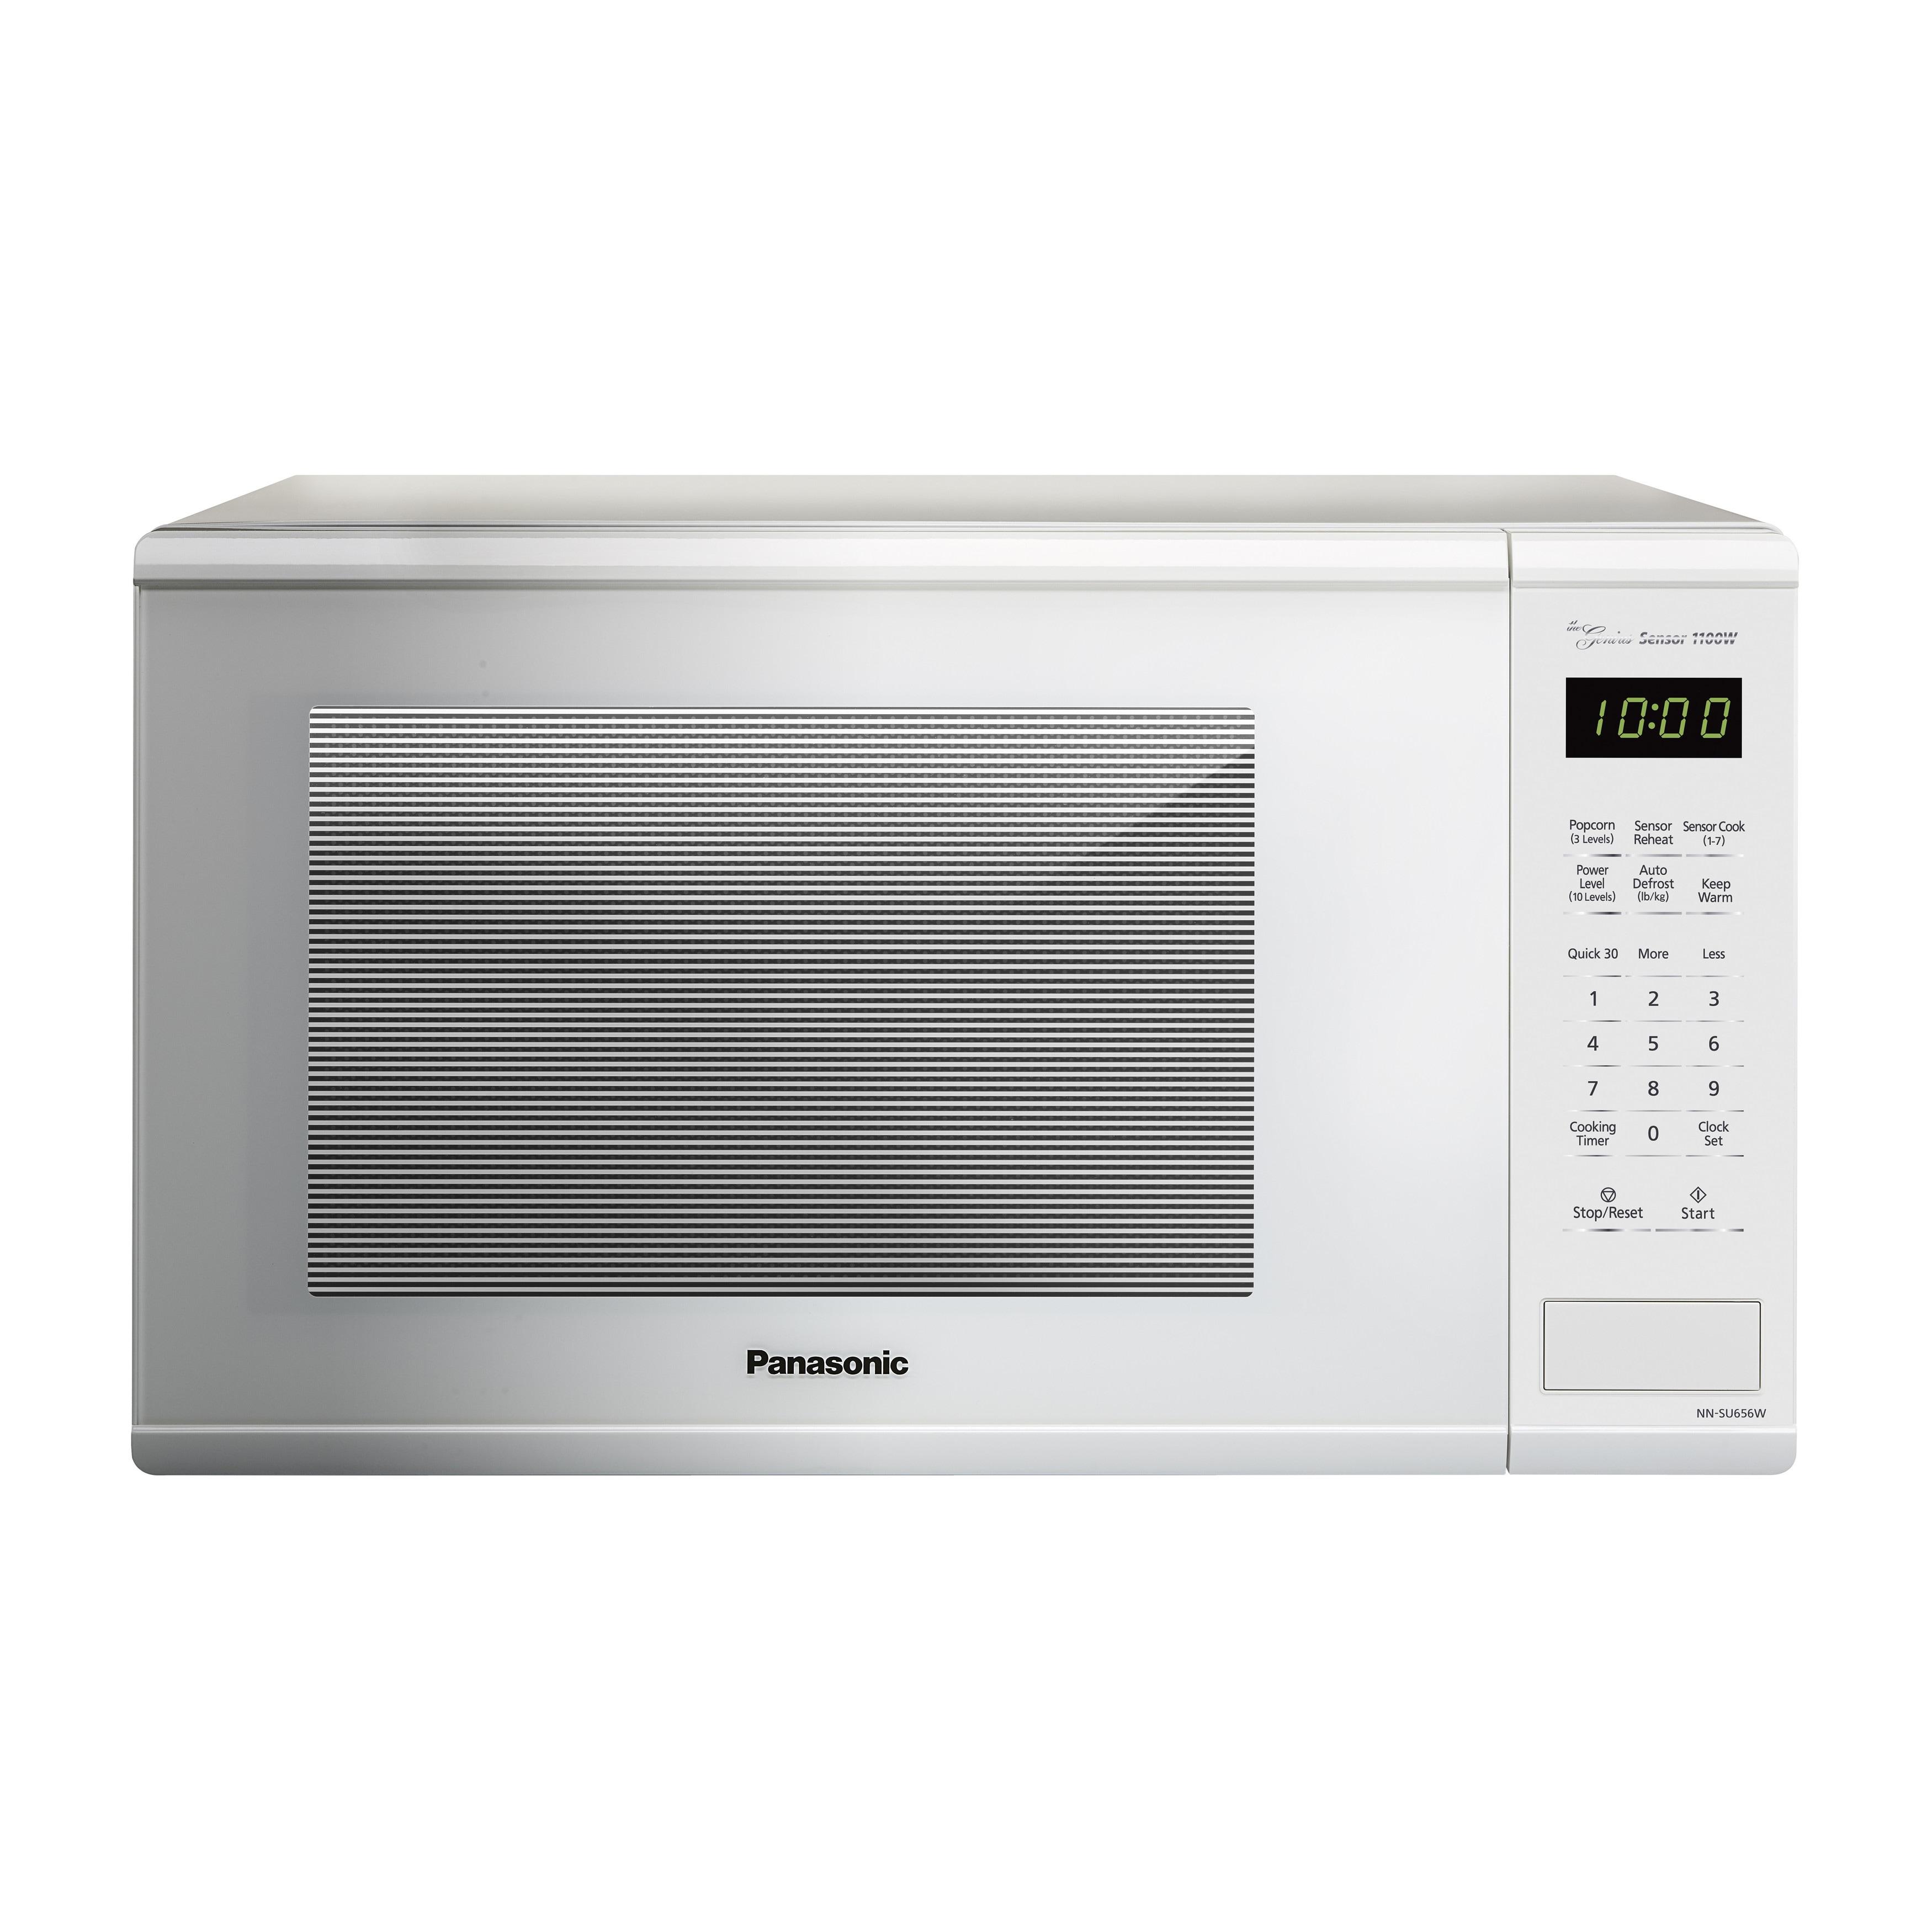 ft panasonic nn sn736w 1 6 cu microwave